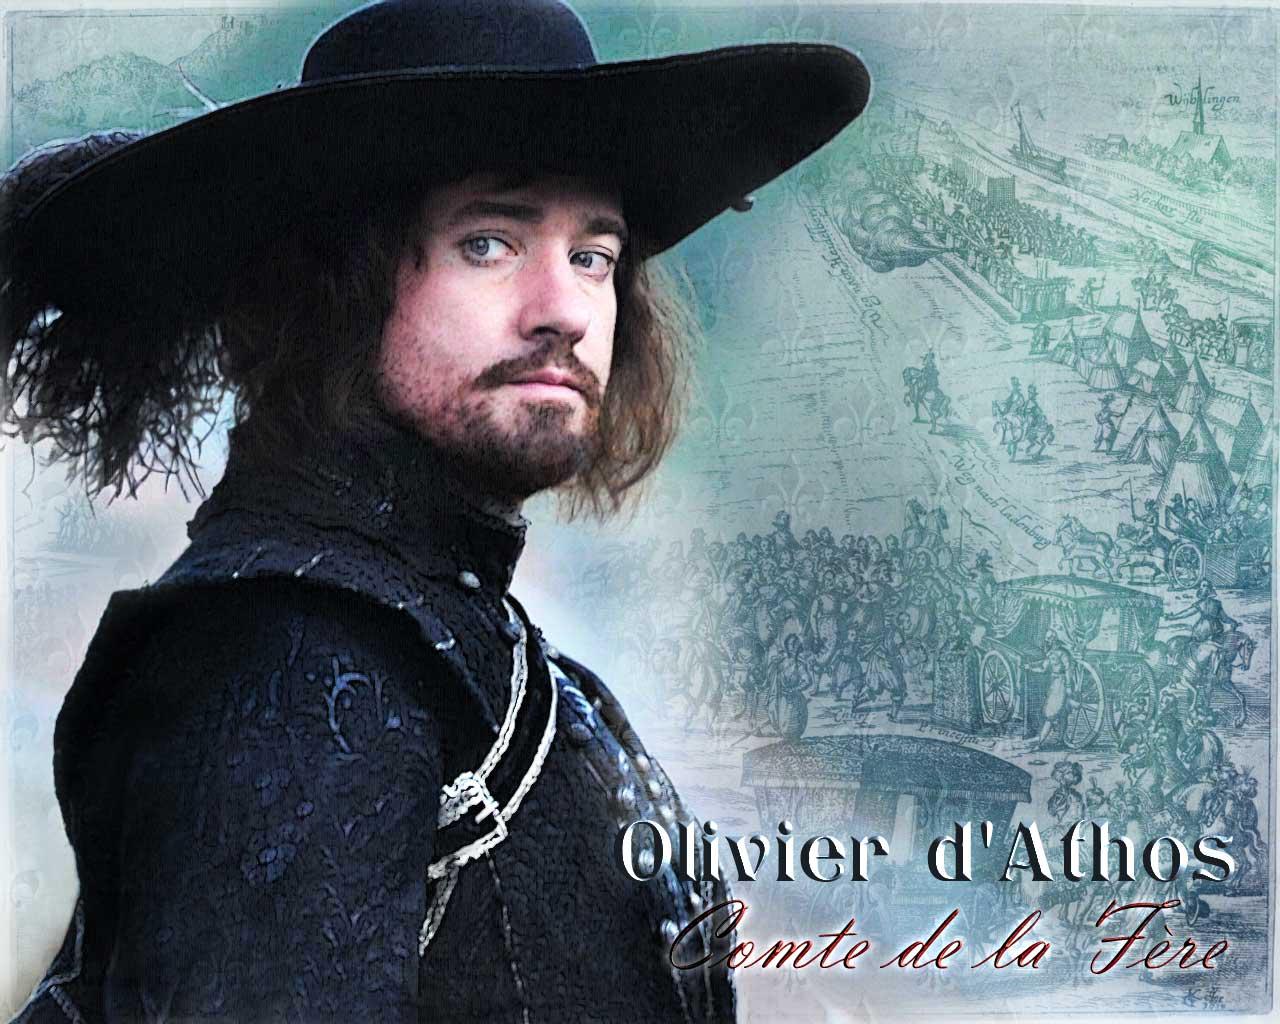 http://3.bp.blogspot.com/_KfY-acvwGnw/TJdeBjBPrLI/AAAAAAAAJyI/cwSImJ-nVKQ/s1600/Athos.jpg